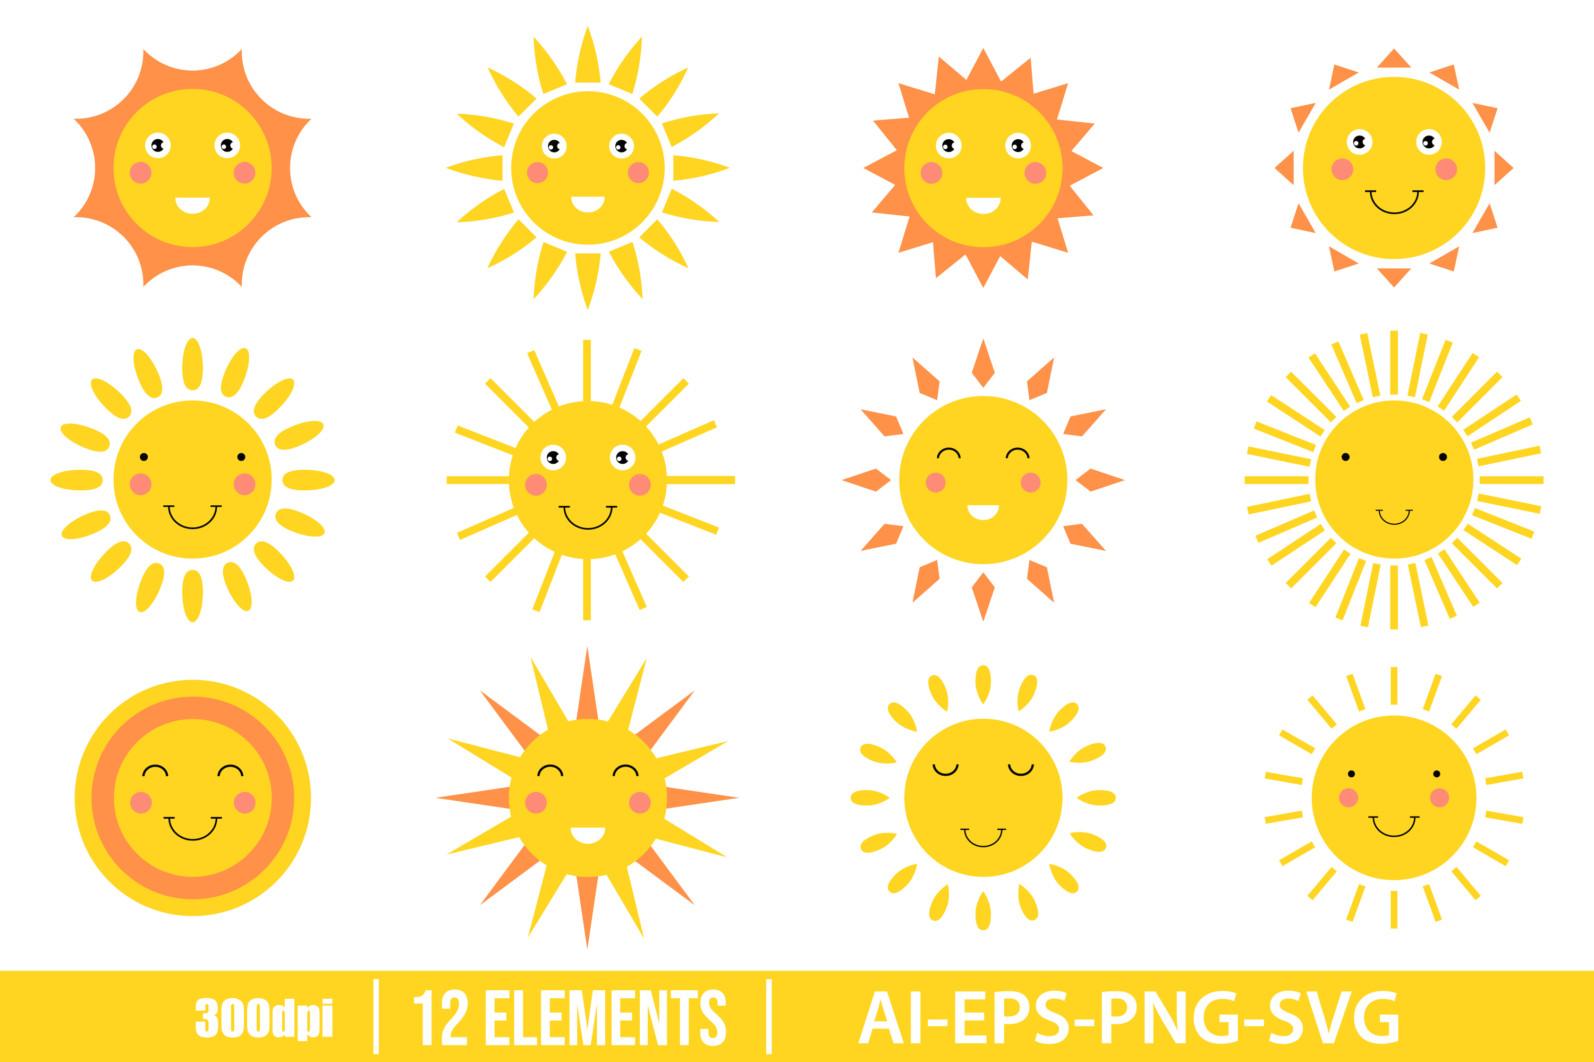 Smiling sun cartoon clipart vector design illustration. Vector Clipart Print - CUTE HAPPY SUN scaled -